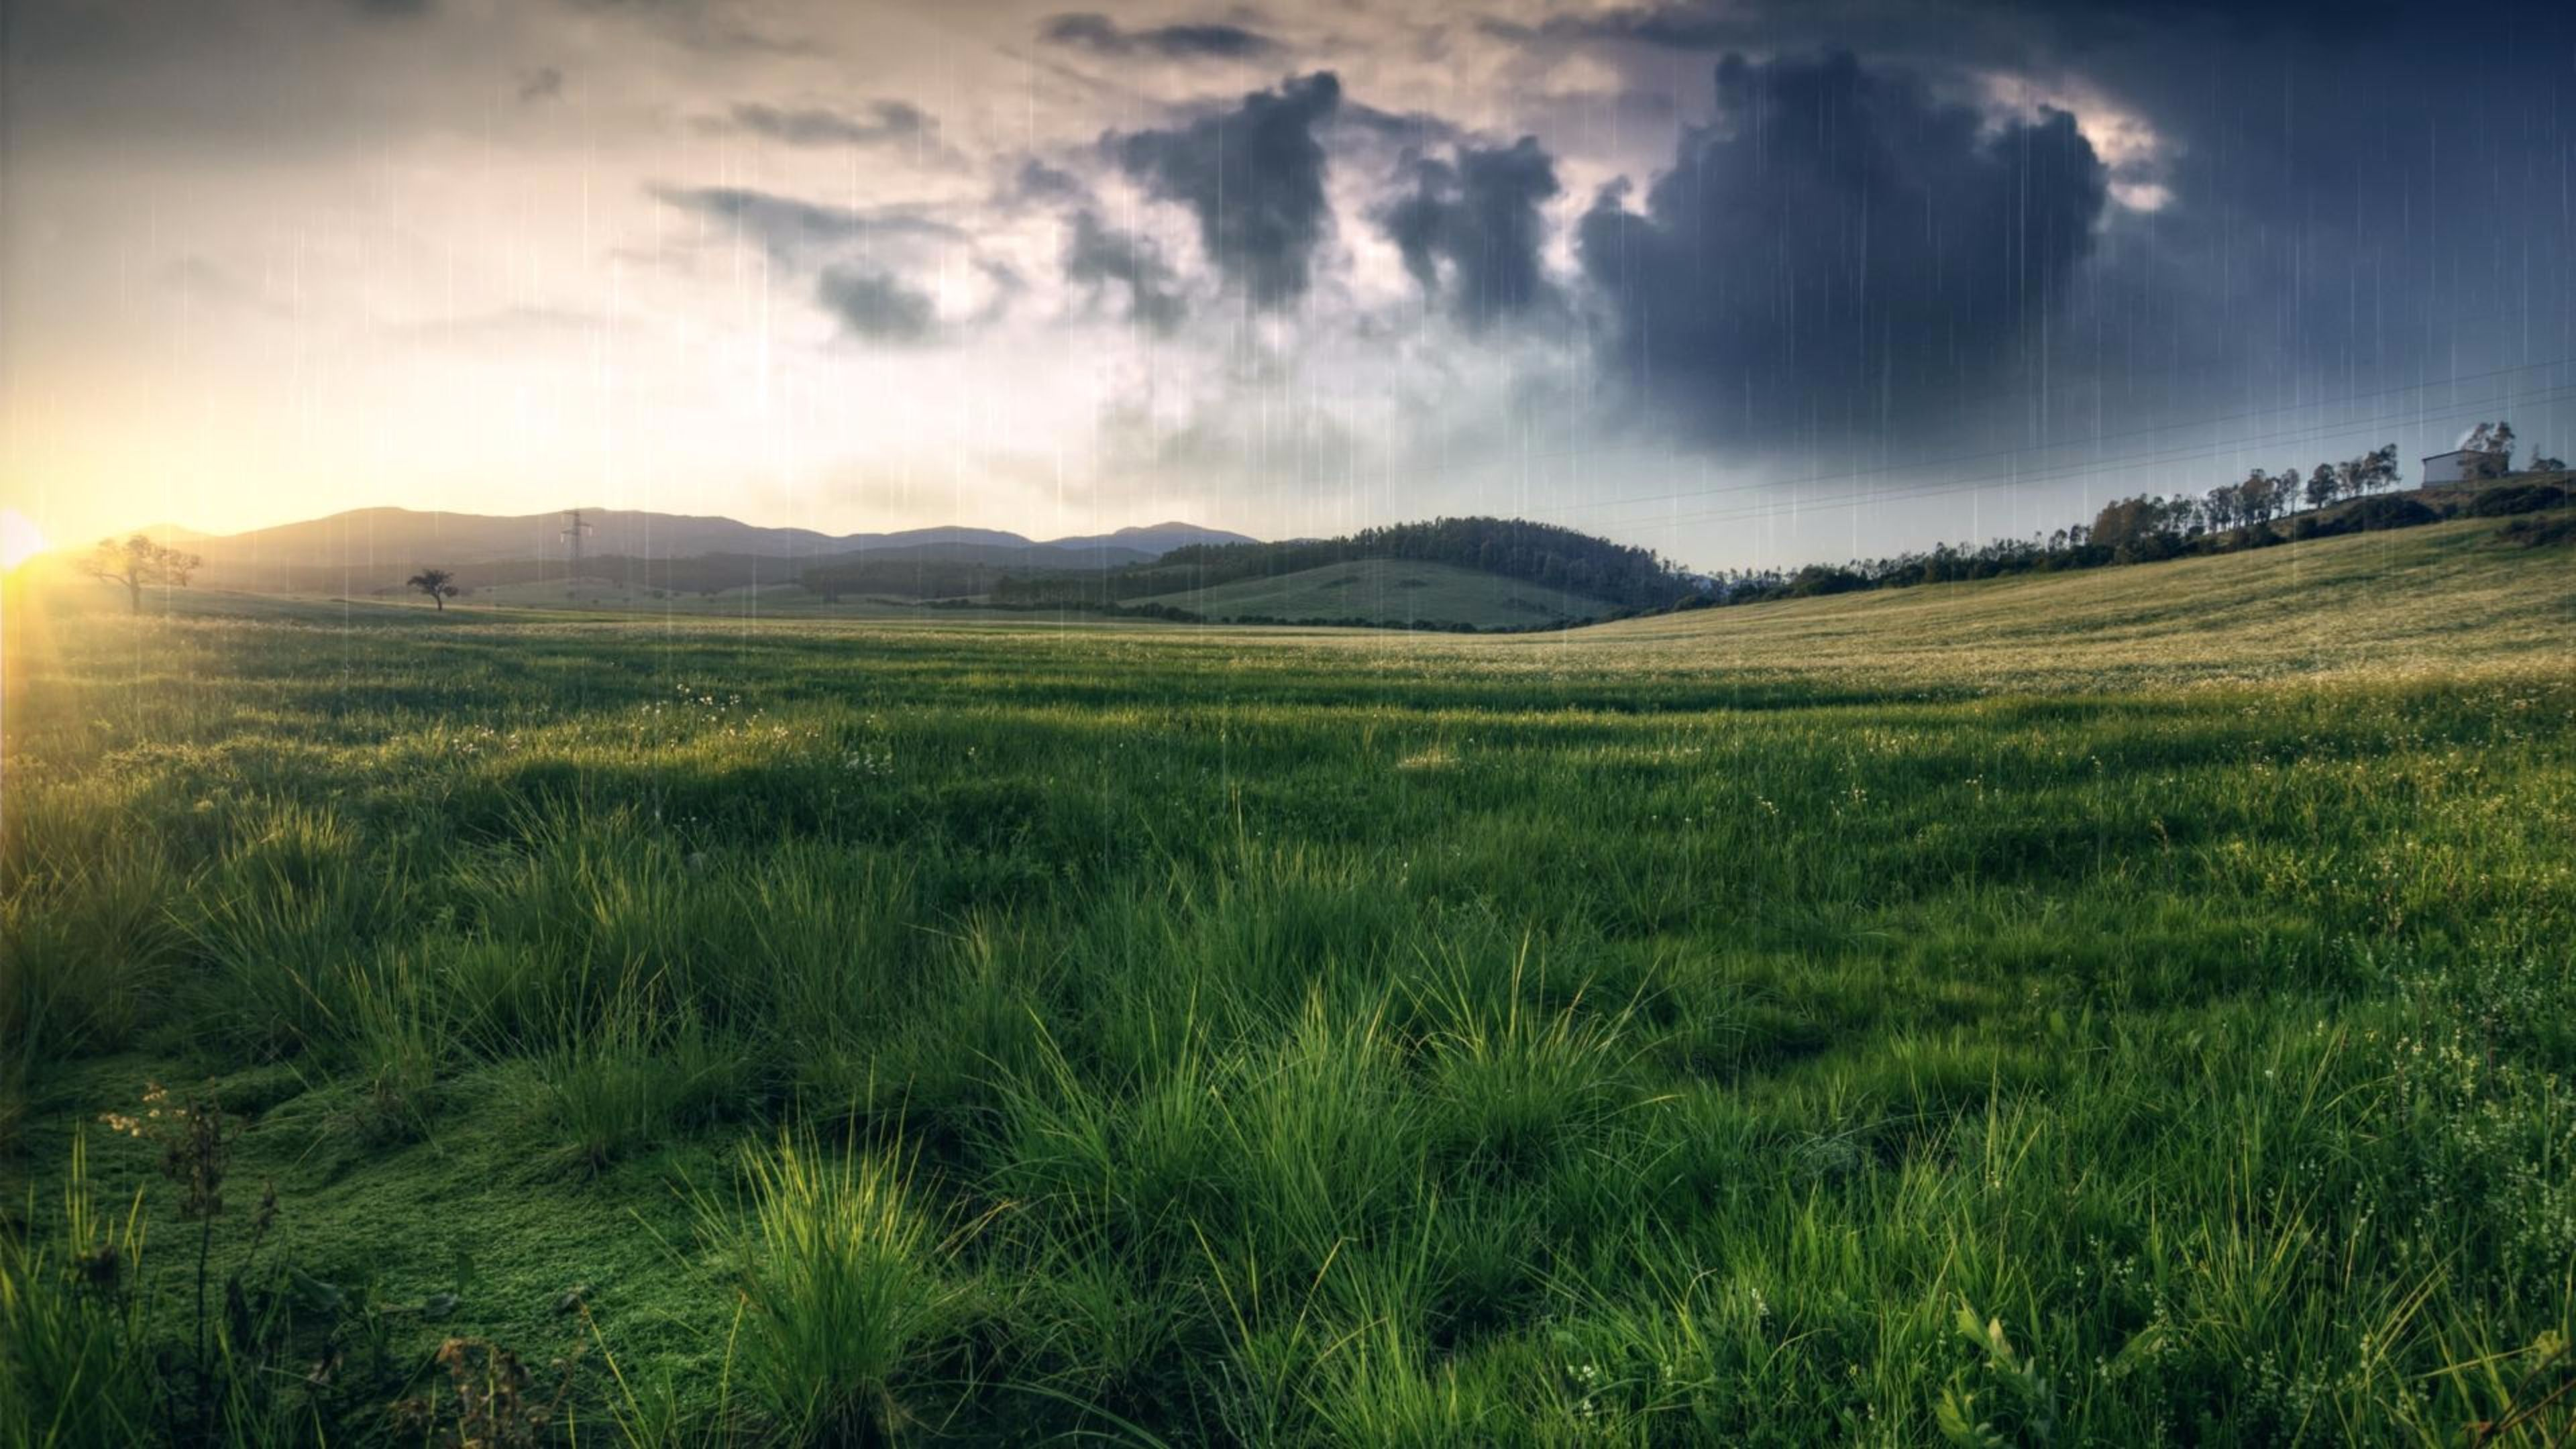 Spring Rain Wallpaper 1080p Free Download Scenery Wallpaper Spring Scenery Landscape Wallpaper